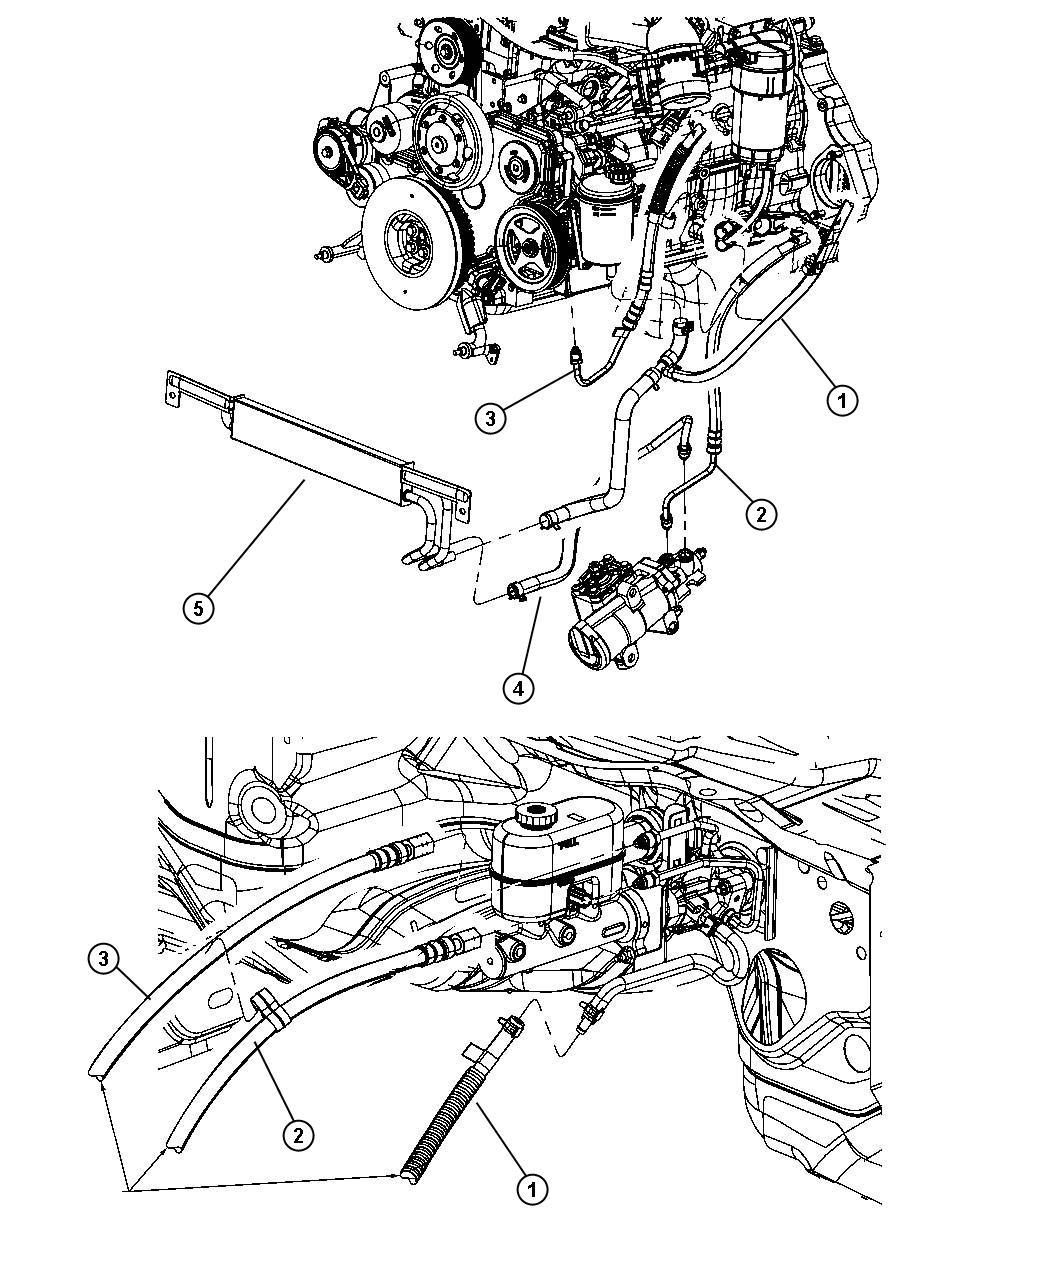 Showassembly additionally Winnebago Chevy Engine Diagram likewise 3ugc6 1996 Dodge Grand Caravan Se Power Steering Leaks Two Hoses furthermore Brakespage moreover 1zfbw Change Power Steering Pump Reservoir 1997. on mopar hydroboost